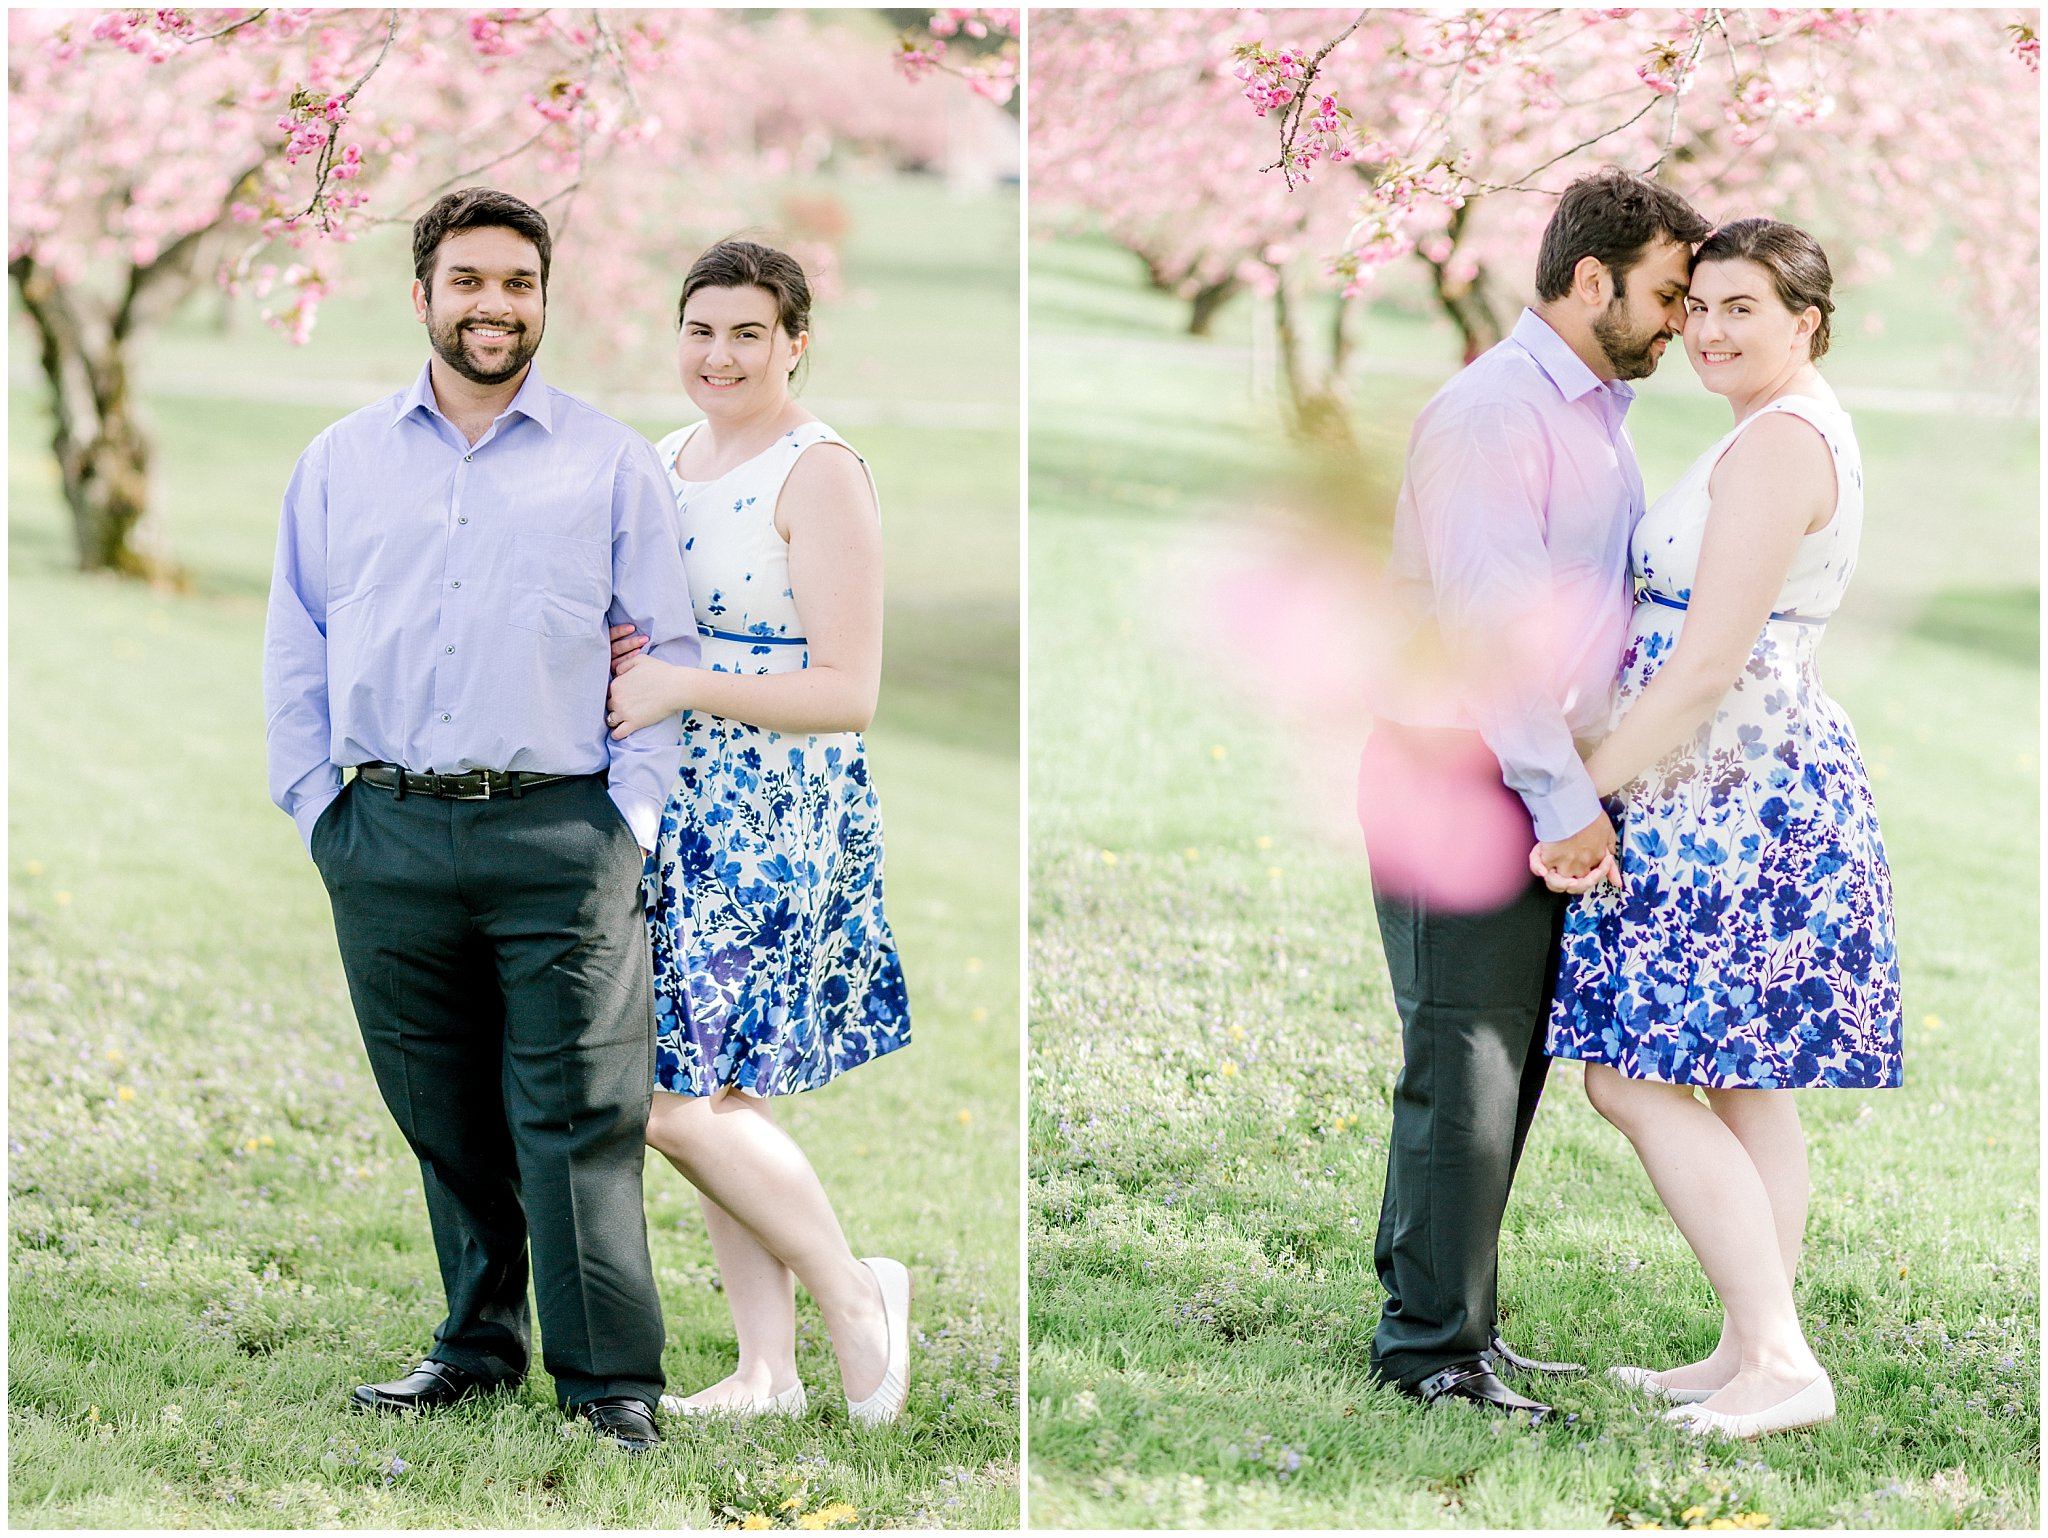 Lehigh Valley Spring Cherry Blossom Engagement Session Pennsylvania Wedding Photographer (6).jpg